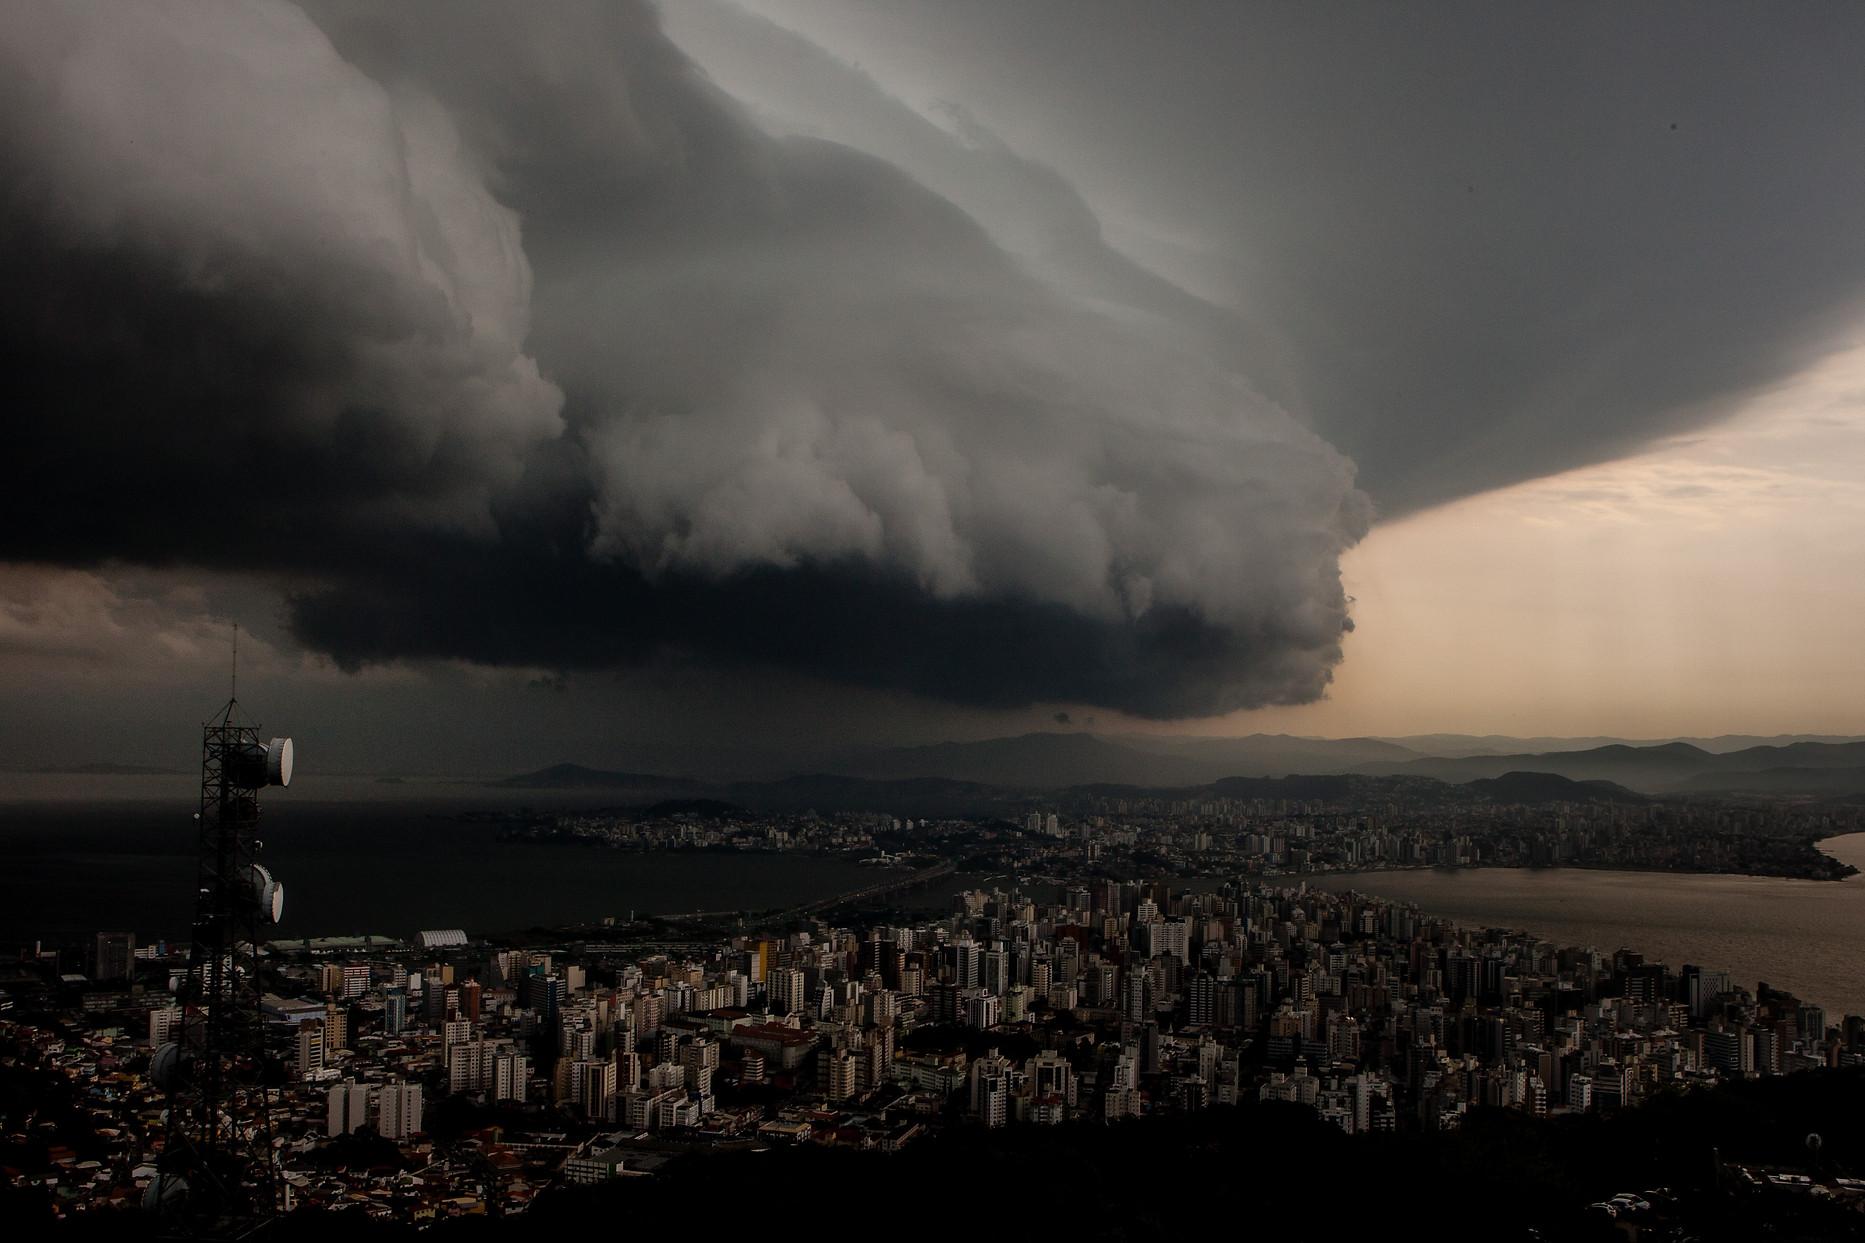 florianopolis-tempestade-virada-de-tempo